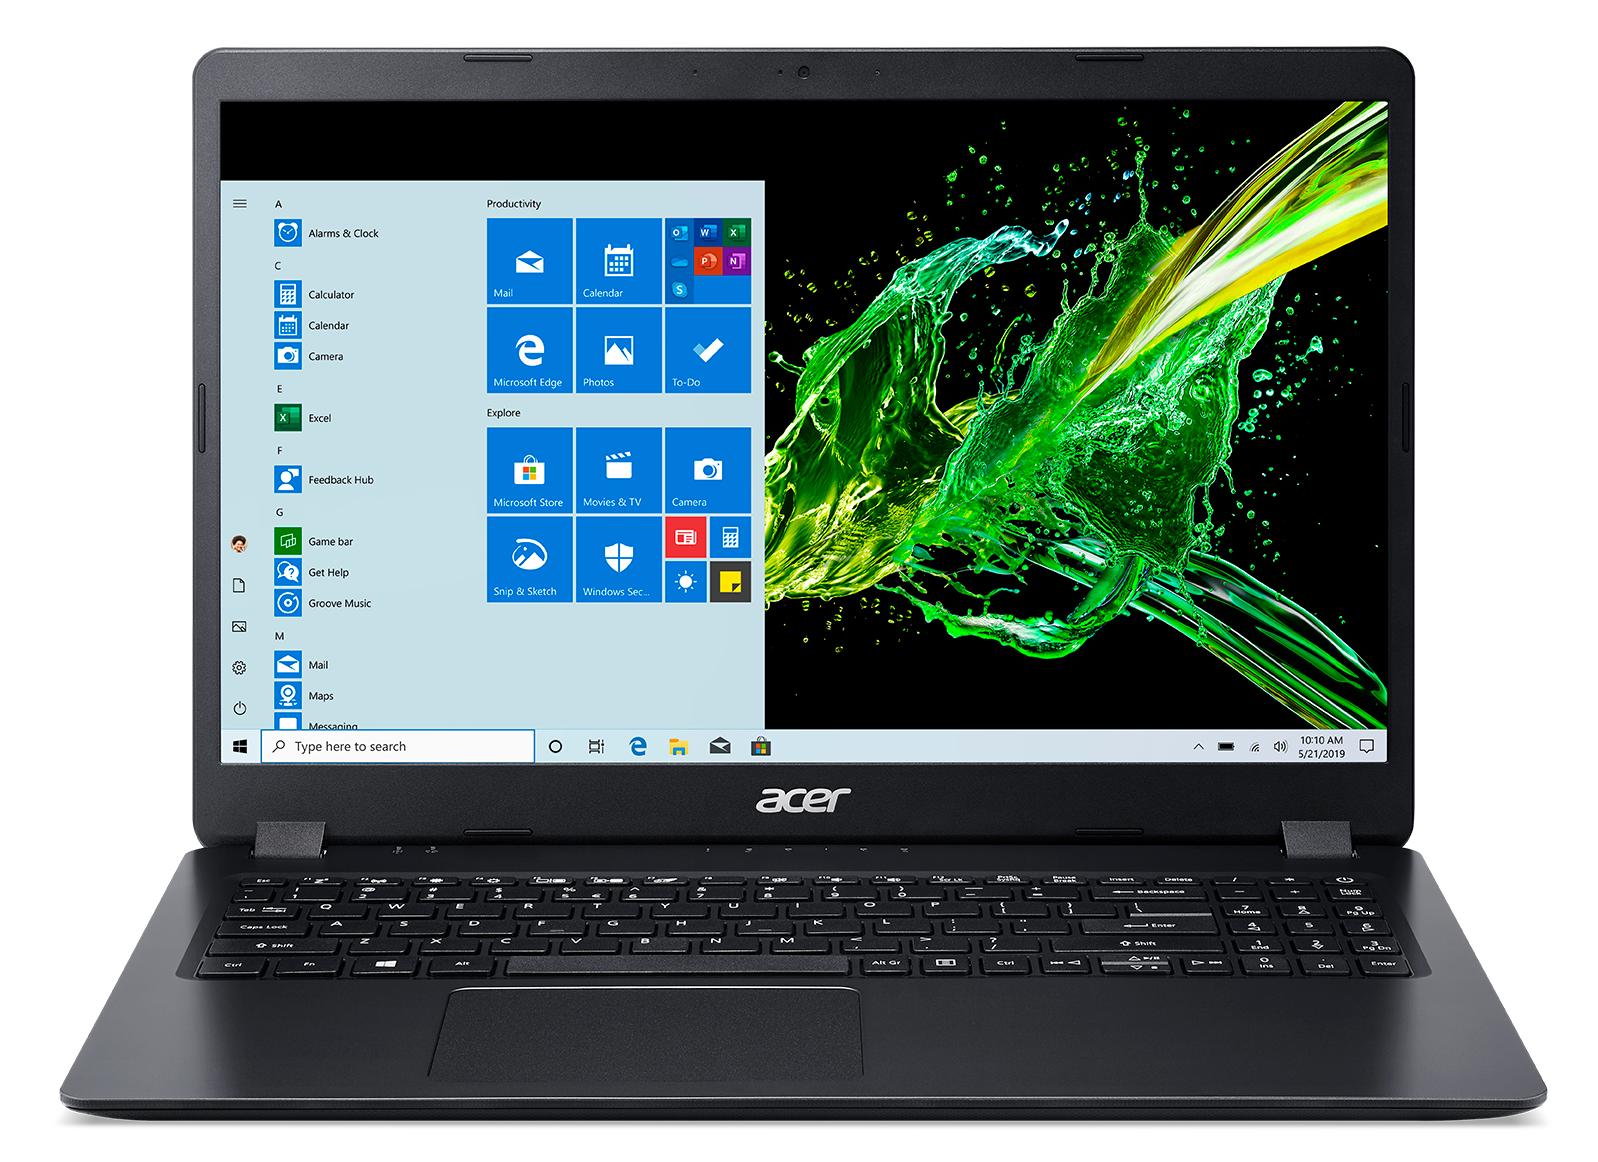 Acer A315-56-308M, 15.6i FHD ComfyView, Intel Core i3-1005G1, 4GB, 512GB PCIe NVMe SSD, Intel UHD Graphics, Wi-Fi 5 AC+ BT 4.0, Win10Home, Black, QWERTY